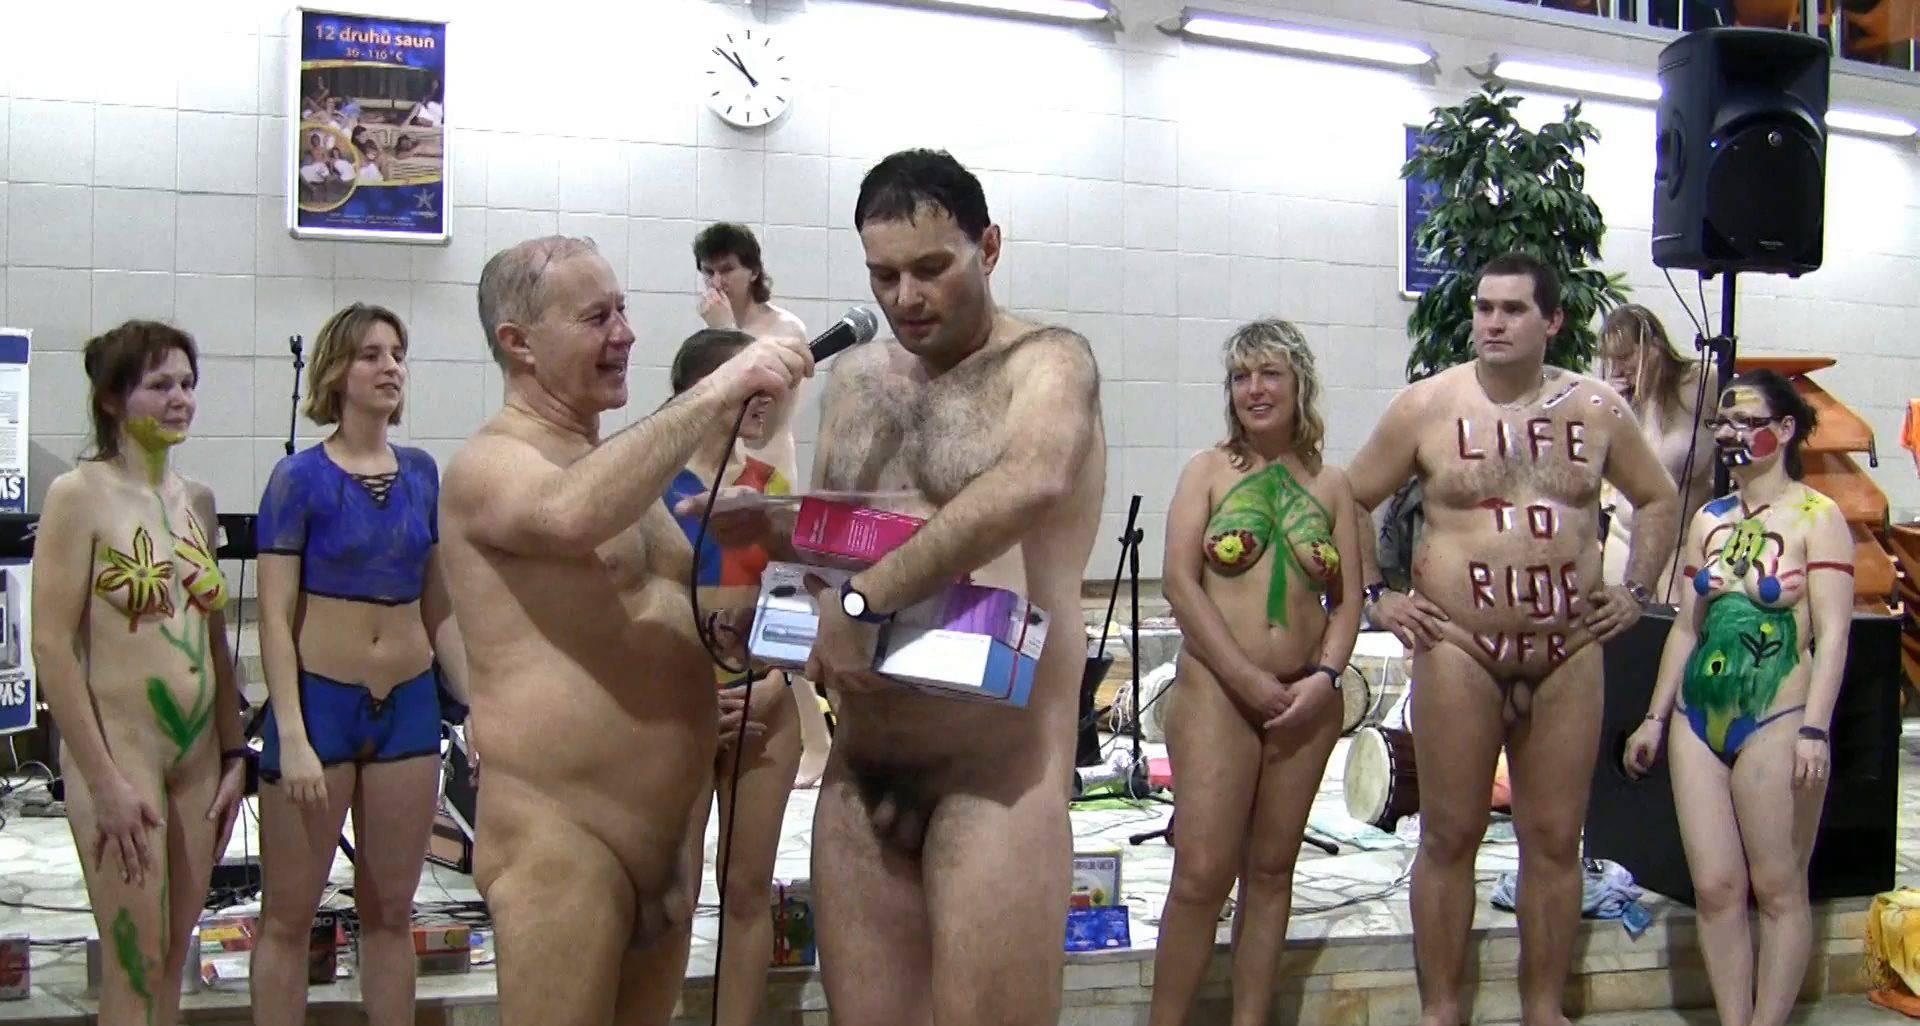 Nudist Movies Grassy Outdoor Fitness - 2